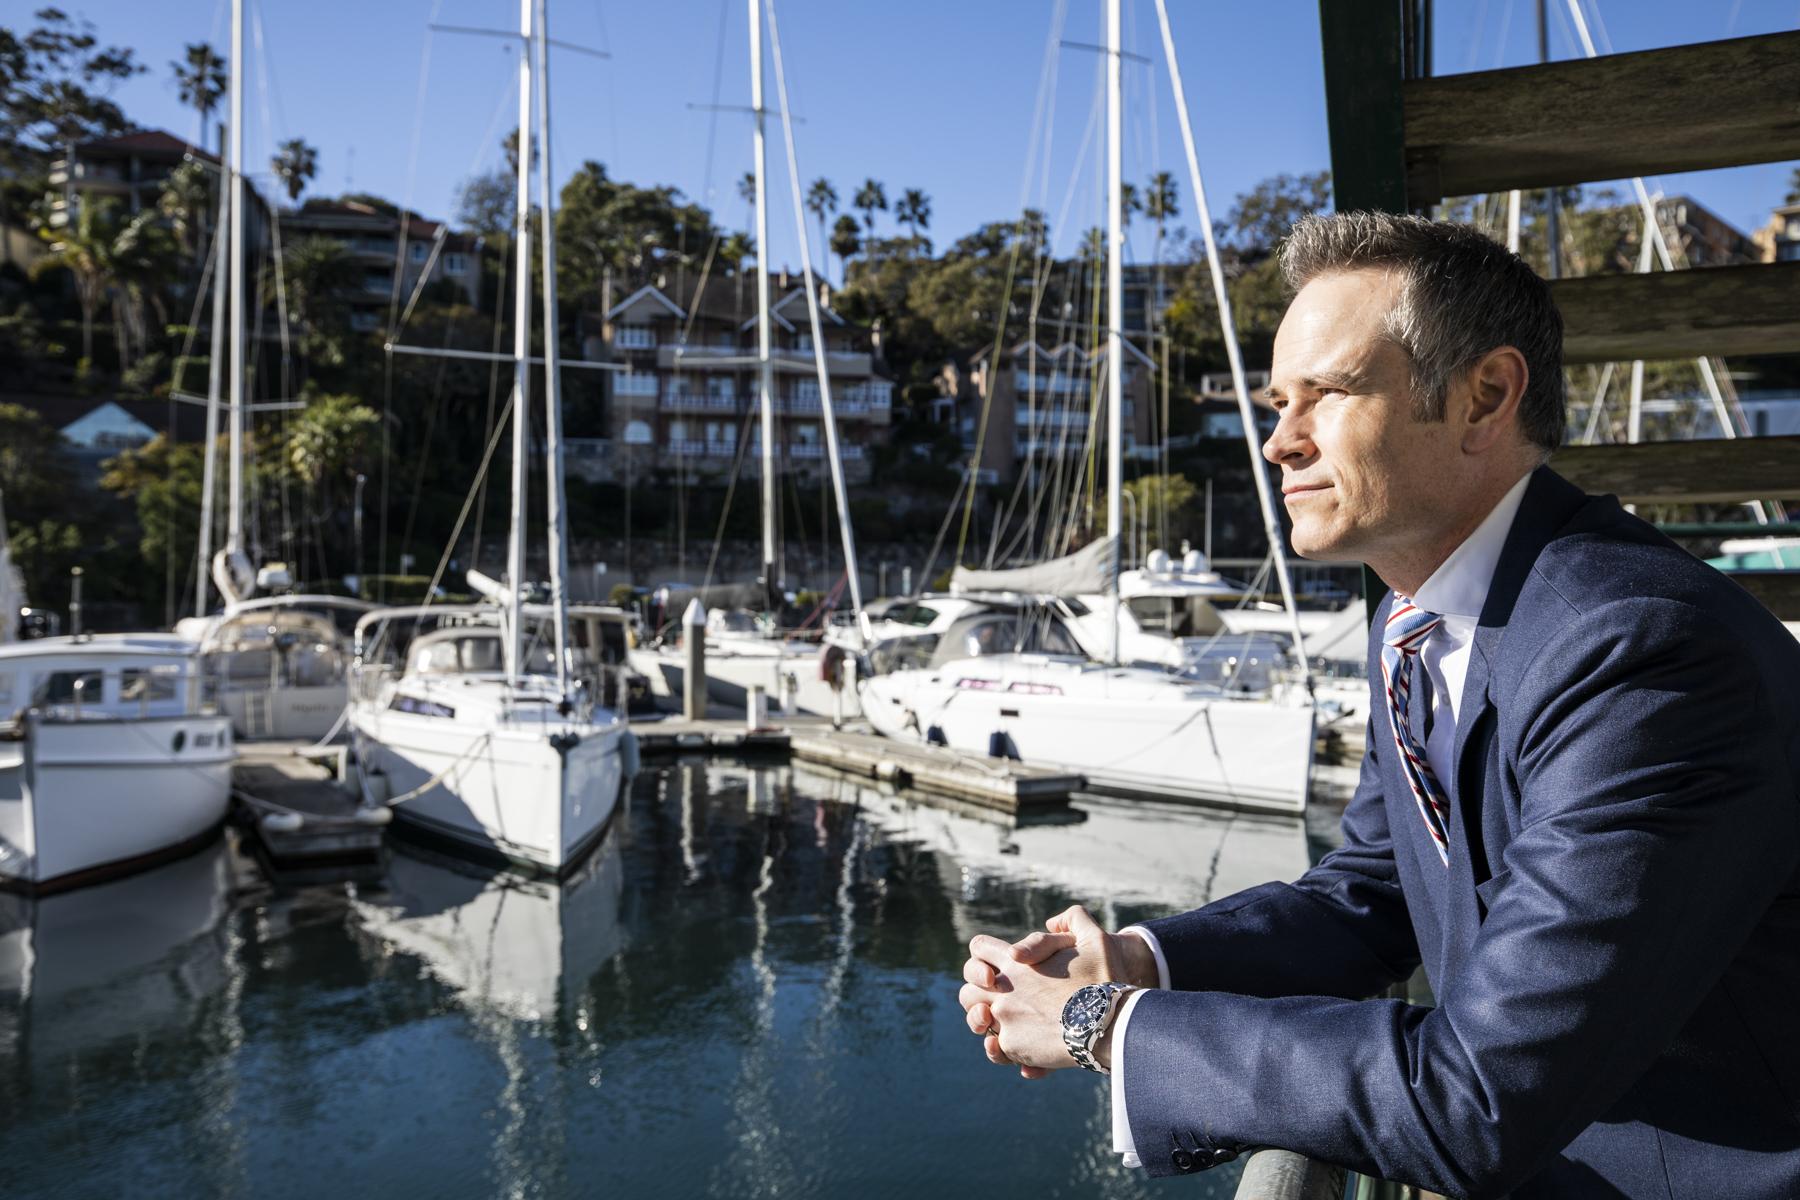 Member Tim James is asking locals to help keep Mosman Rowers afloat.